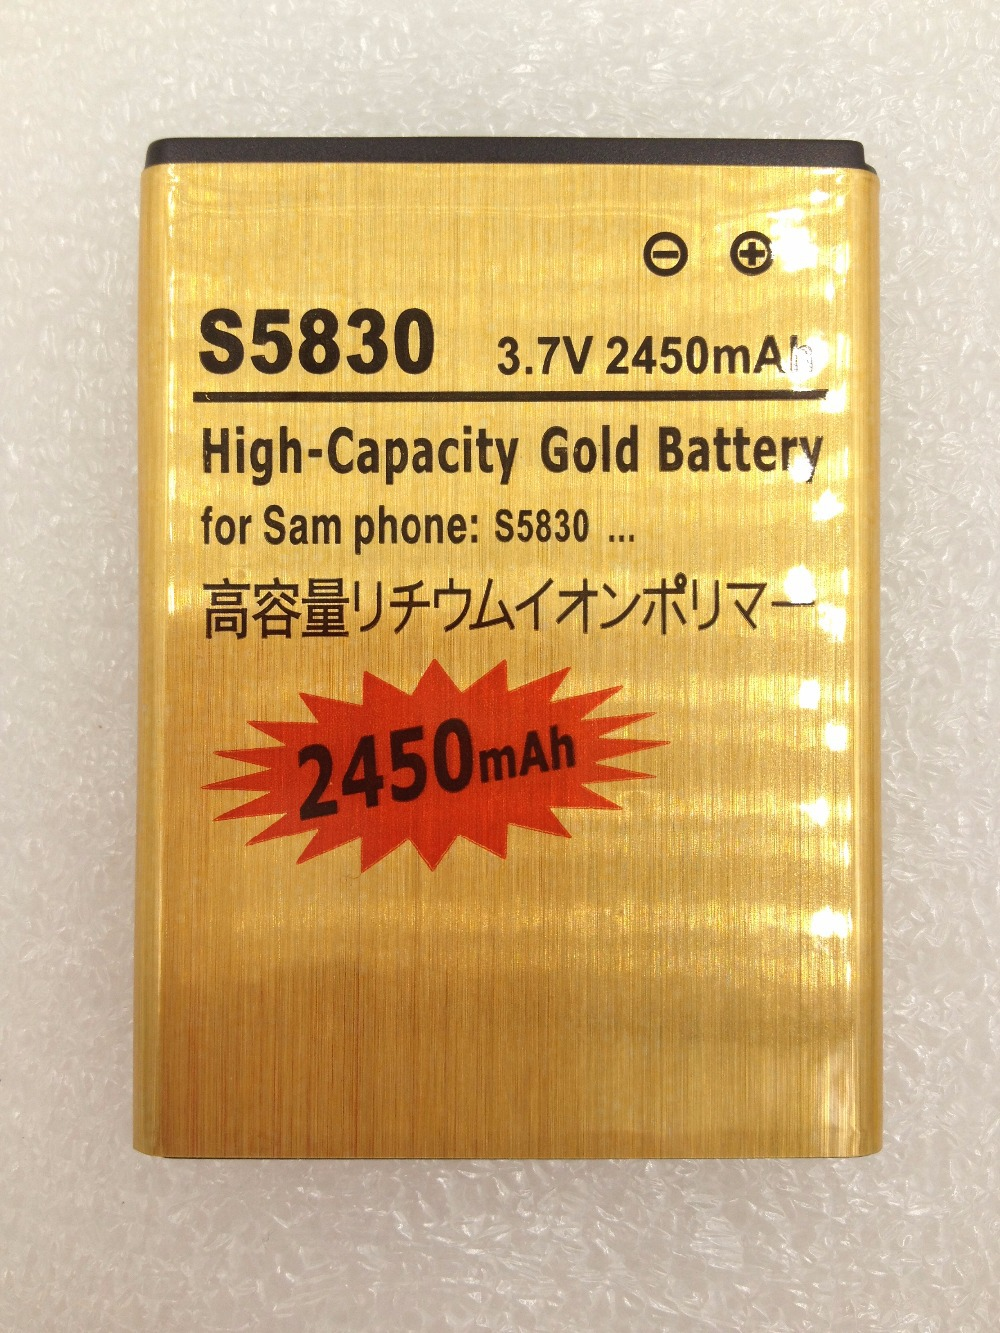 2450mAh High Capacity Gold Battery For Samsung Galaxy Ace S5660 S5670 S6500 S7500 I569 I579 S5838